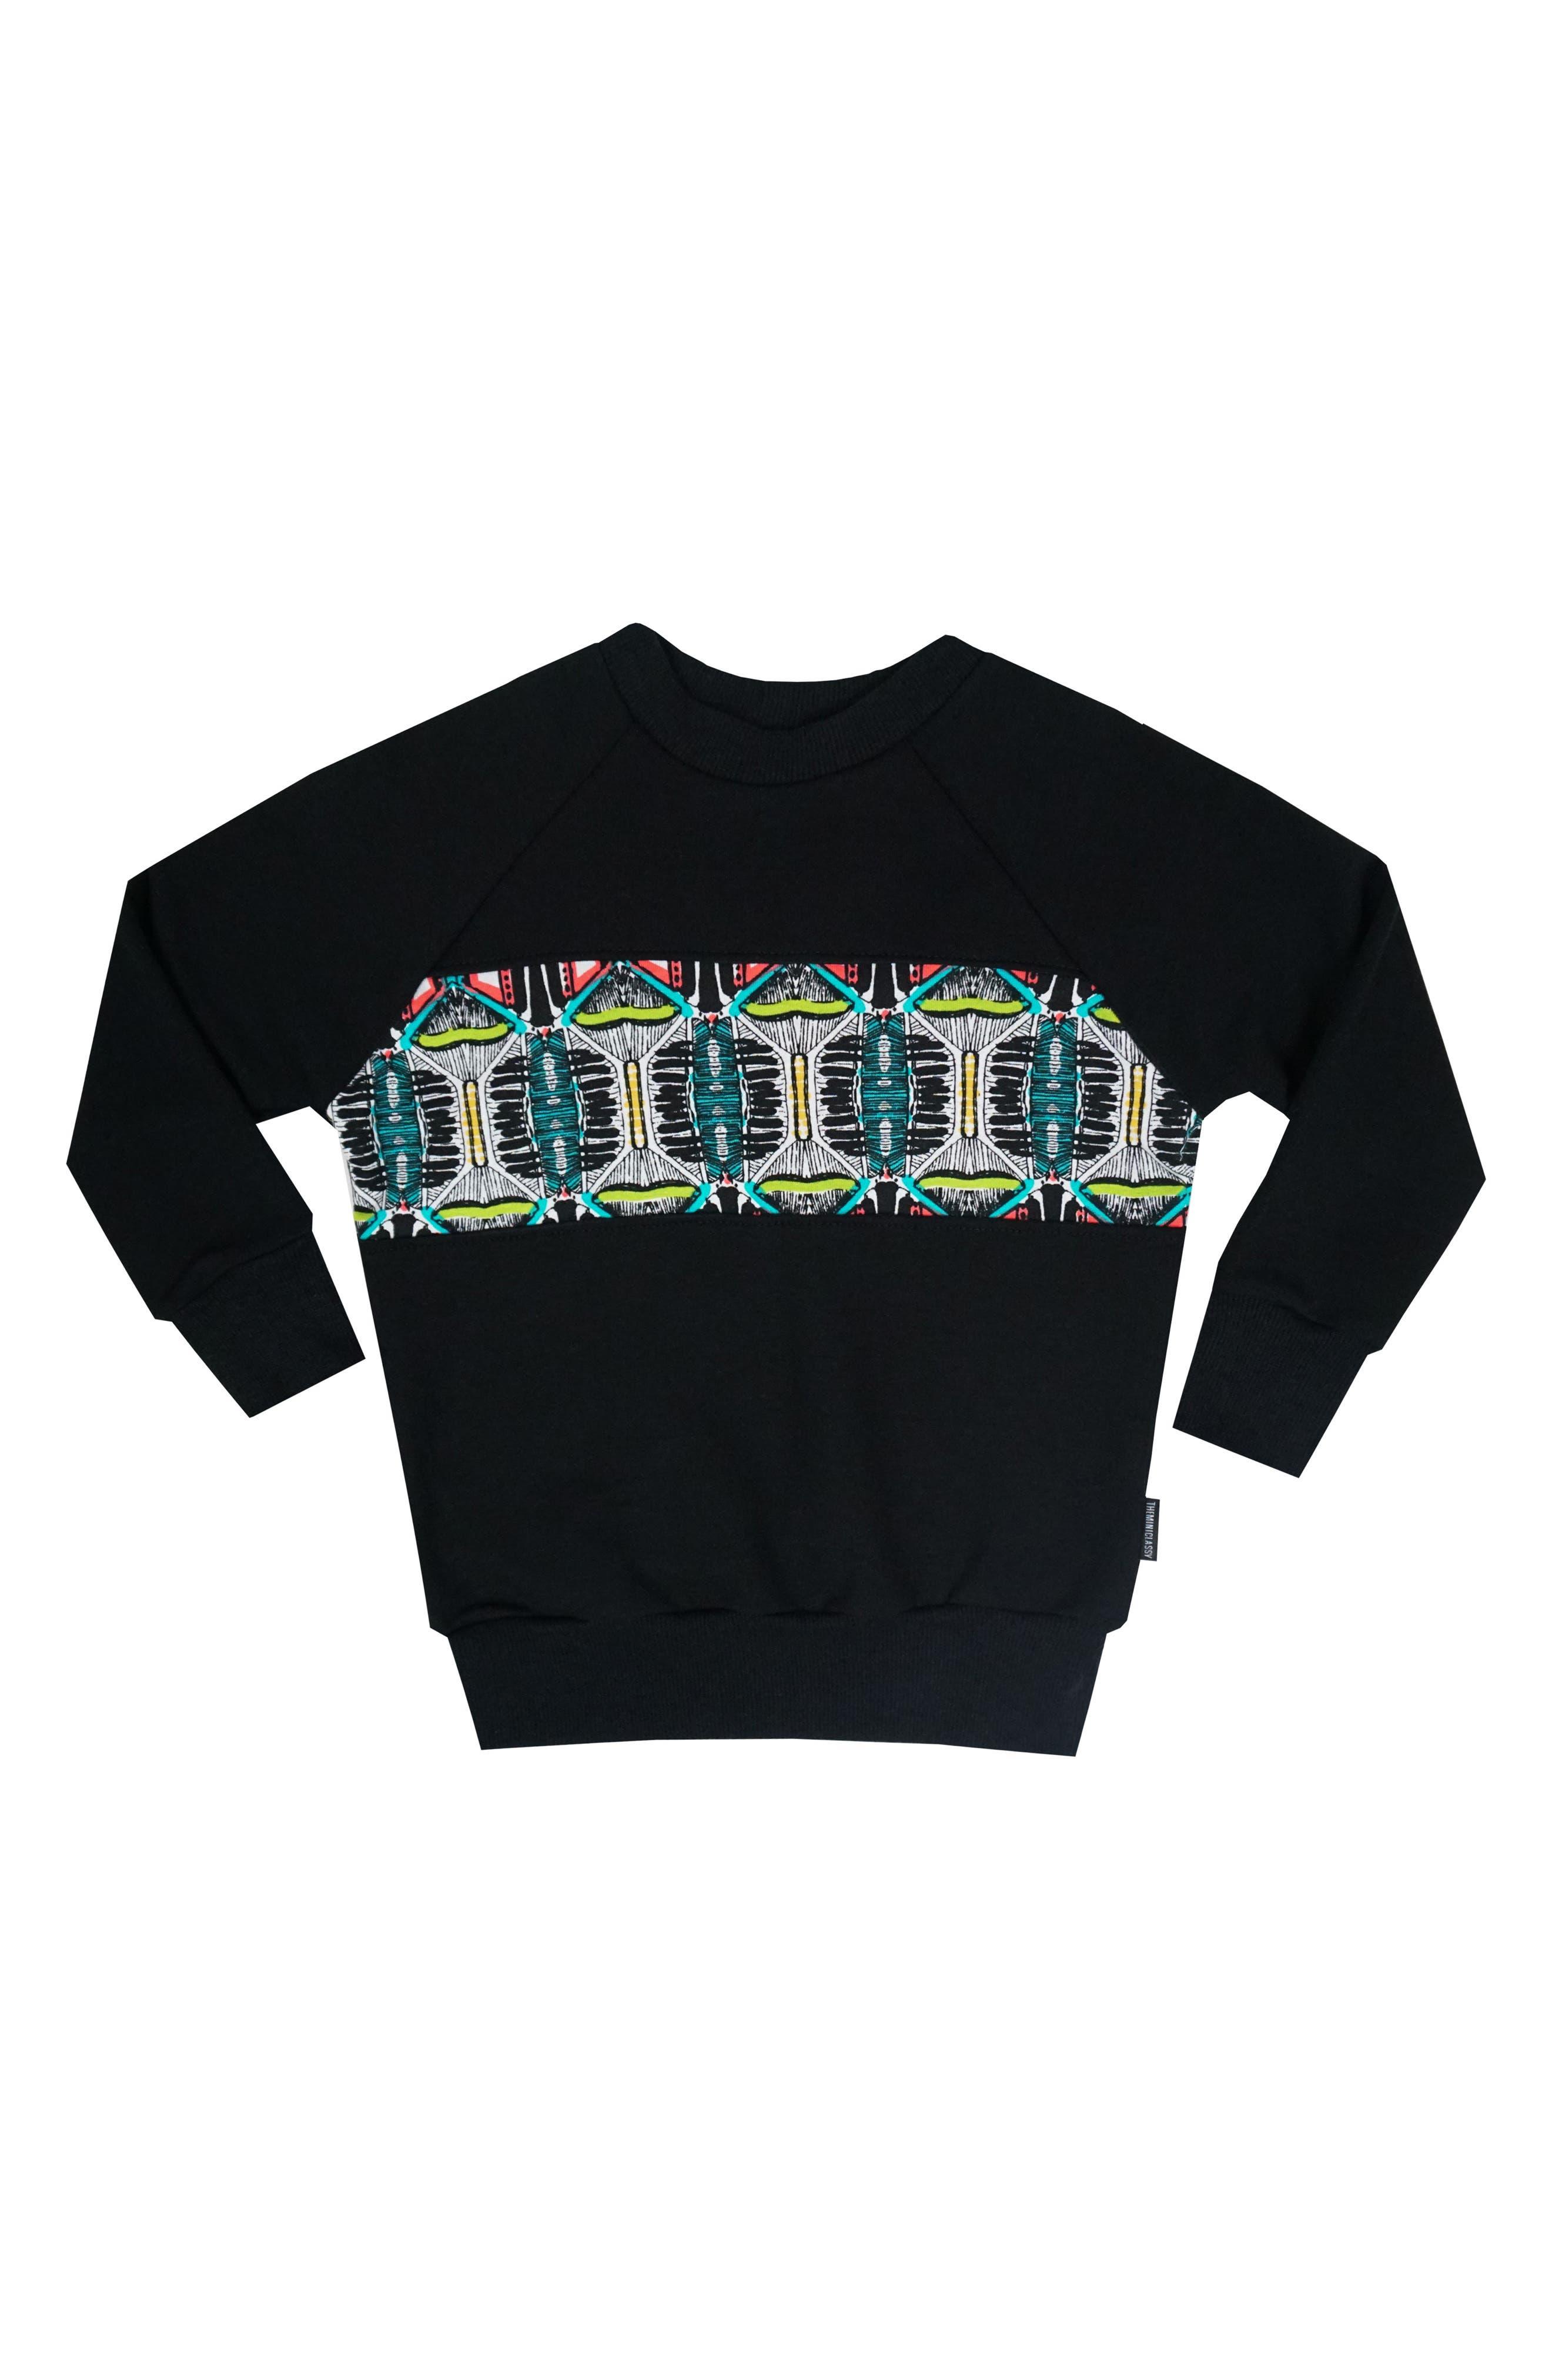 THEMINICLASSY Graphic Long Sleeve T-Shirt (Toddler Boys, Little Boys & Big Boys)